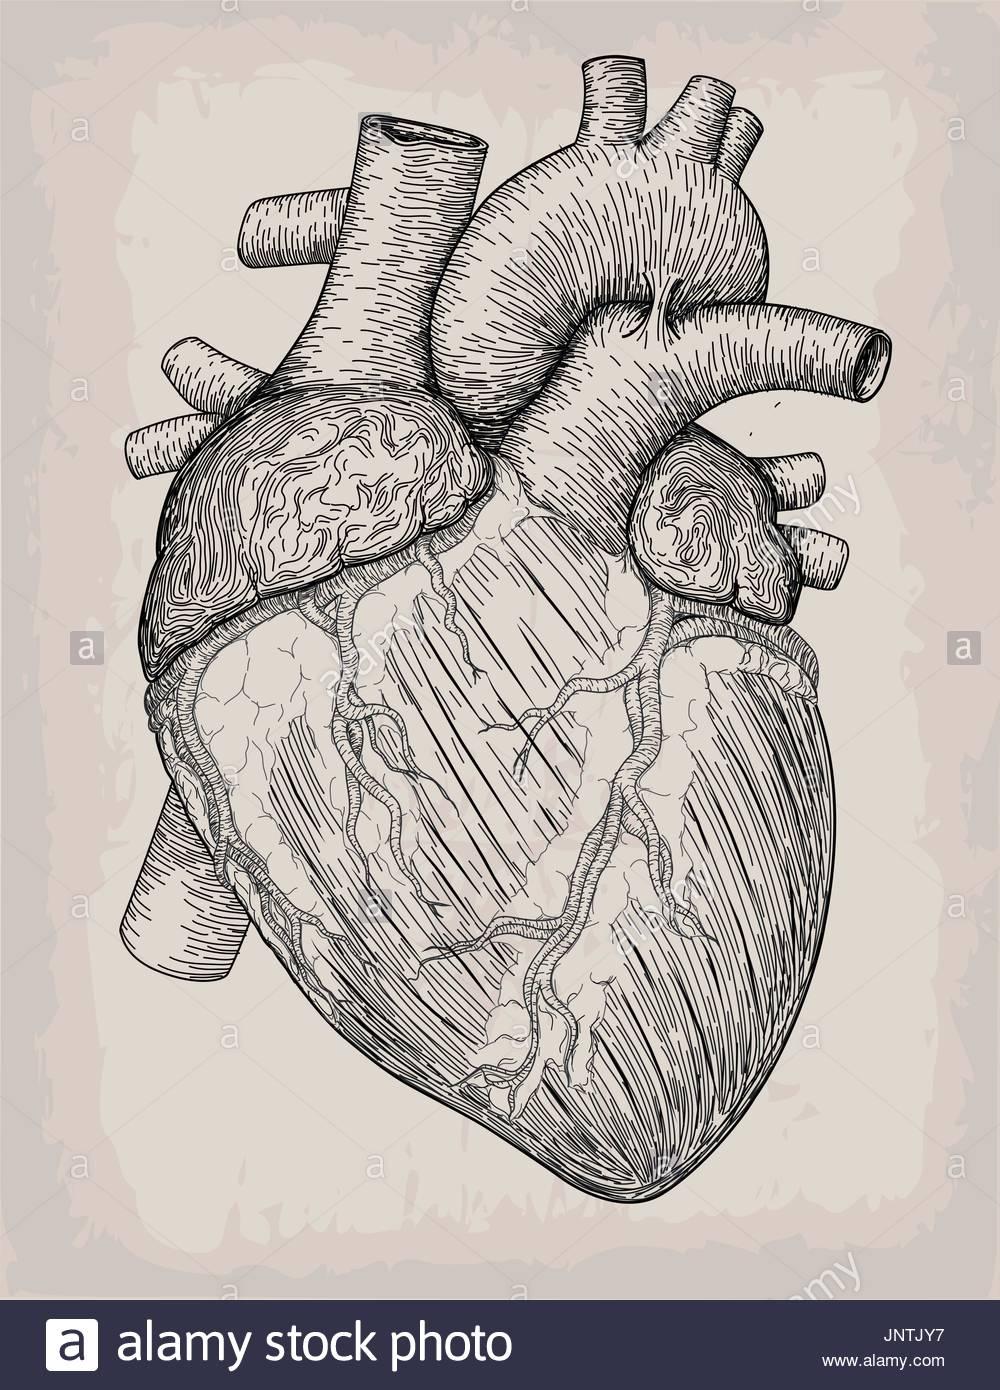 1000x1390 Human Heart Hand Drawn. Anatomical Sketch. Medicine, Vector Stock